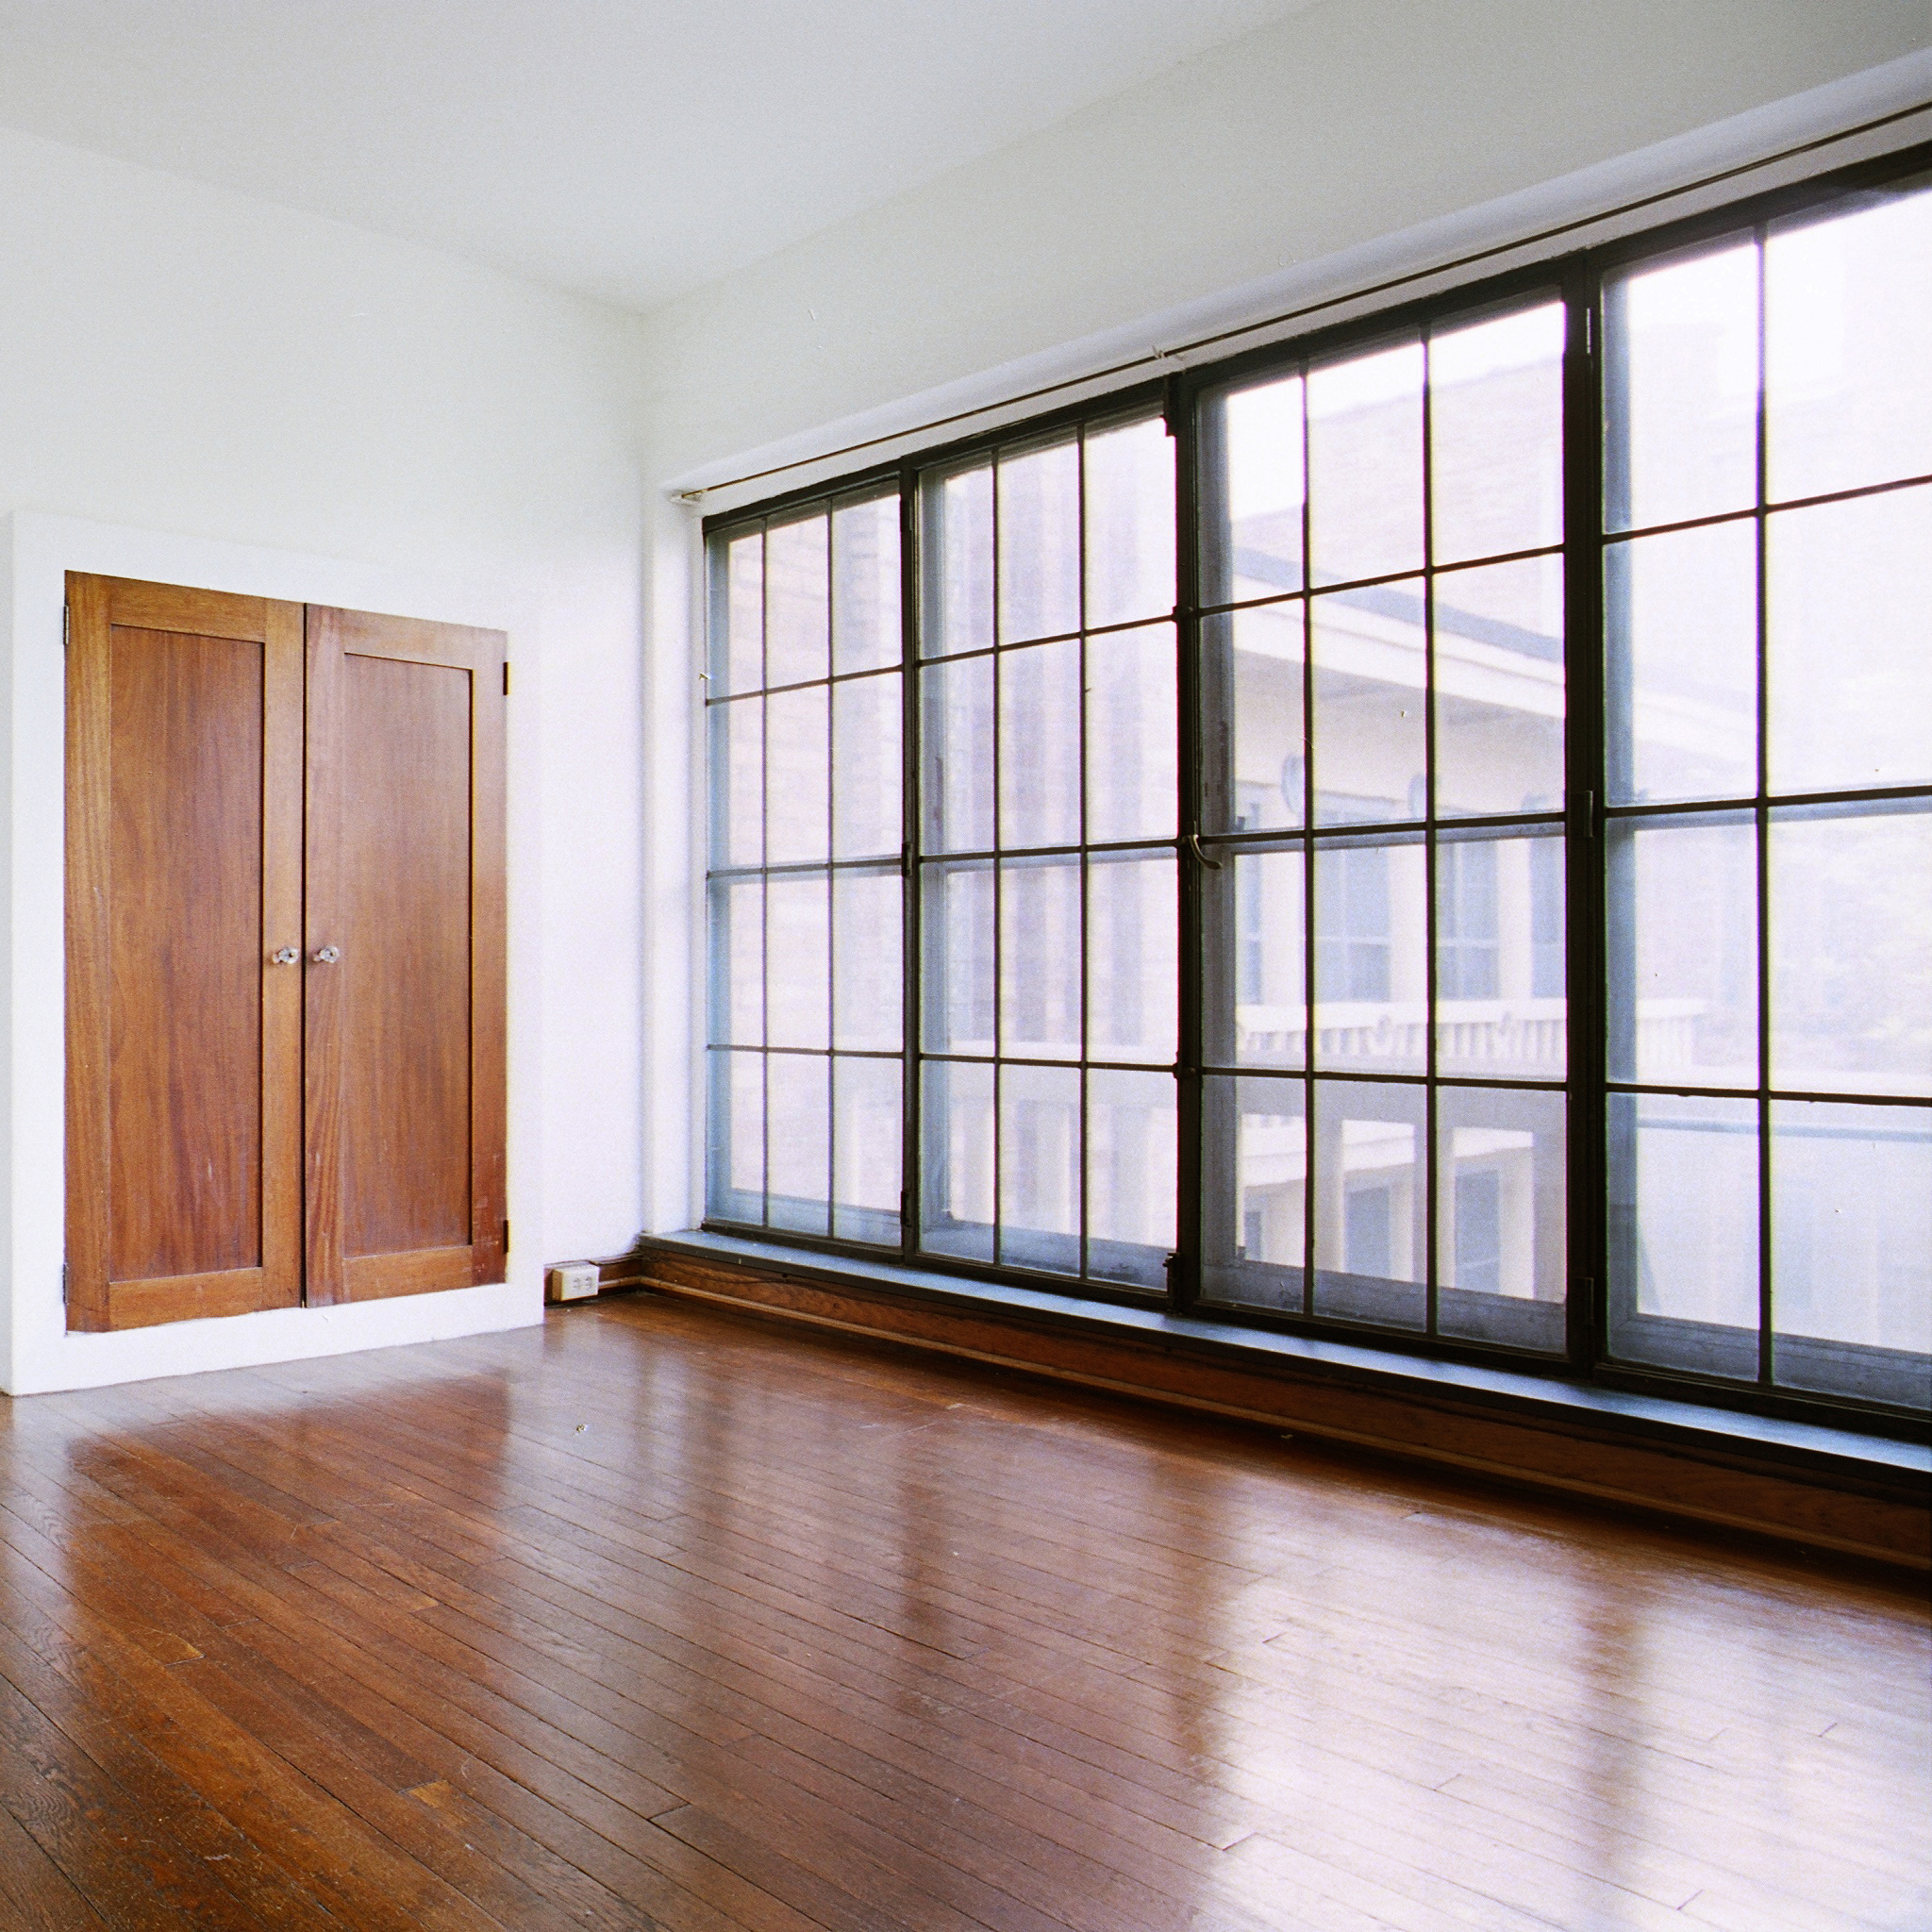 interior of 342 S. Highland Ave, Apt. 15A 6